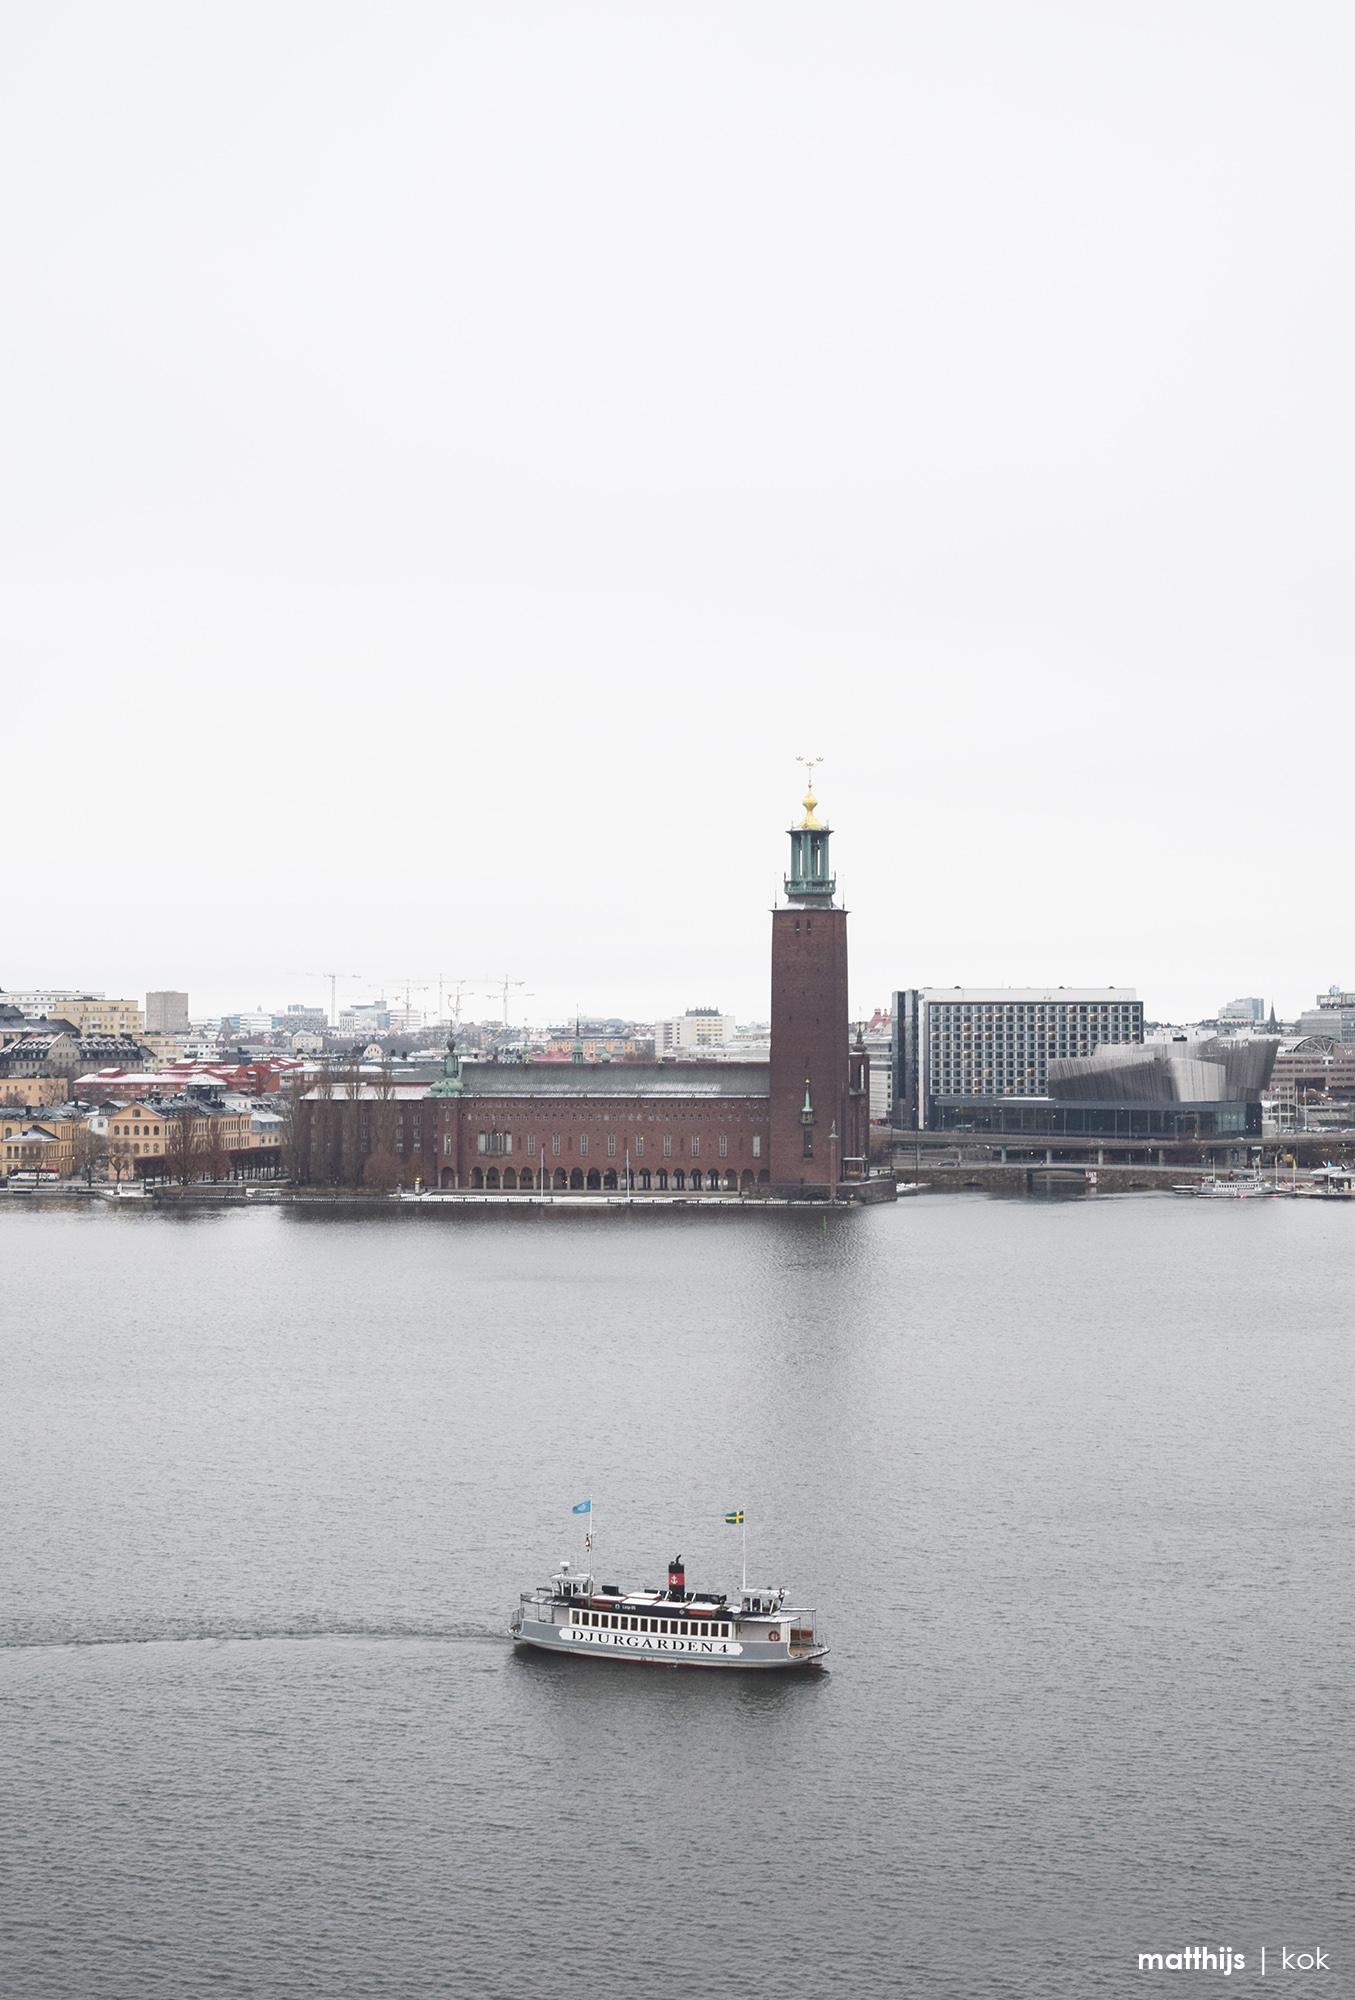 Stockholms Stadshus, Sweden | Photo by Matthijs Kok